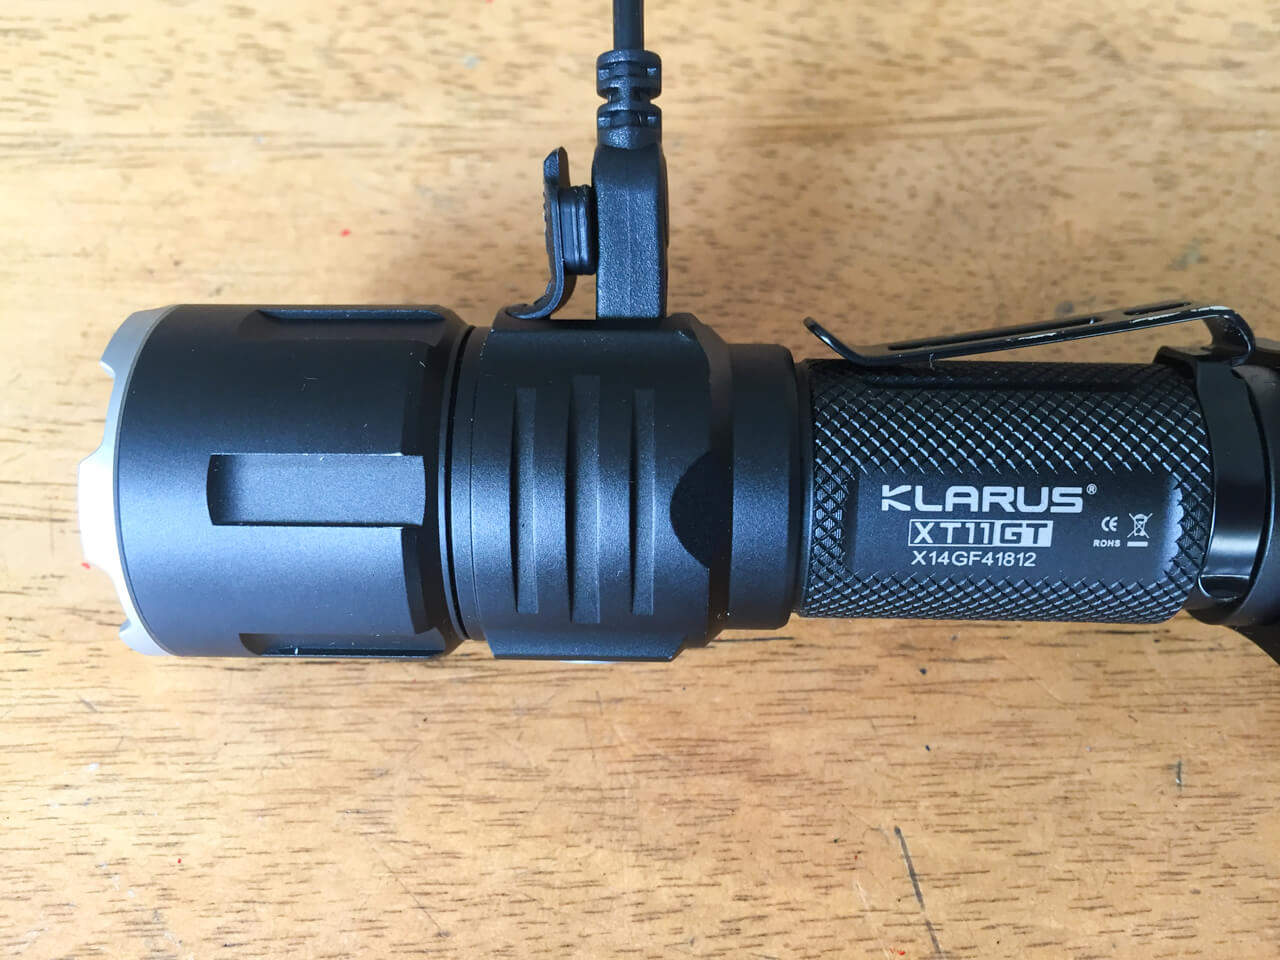 USB charging on Klarus XT11GT